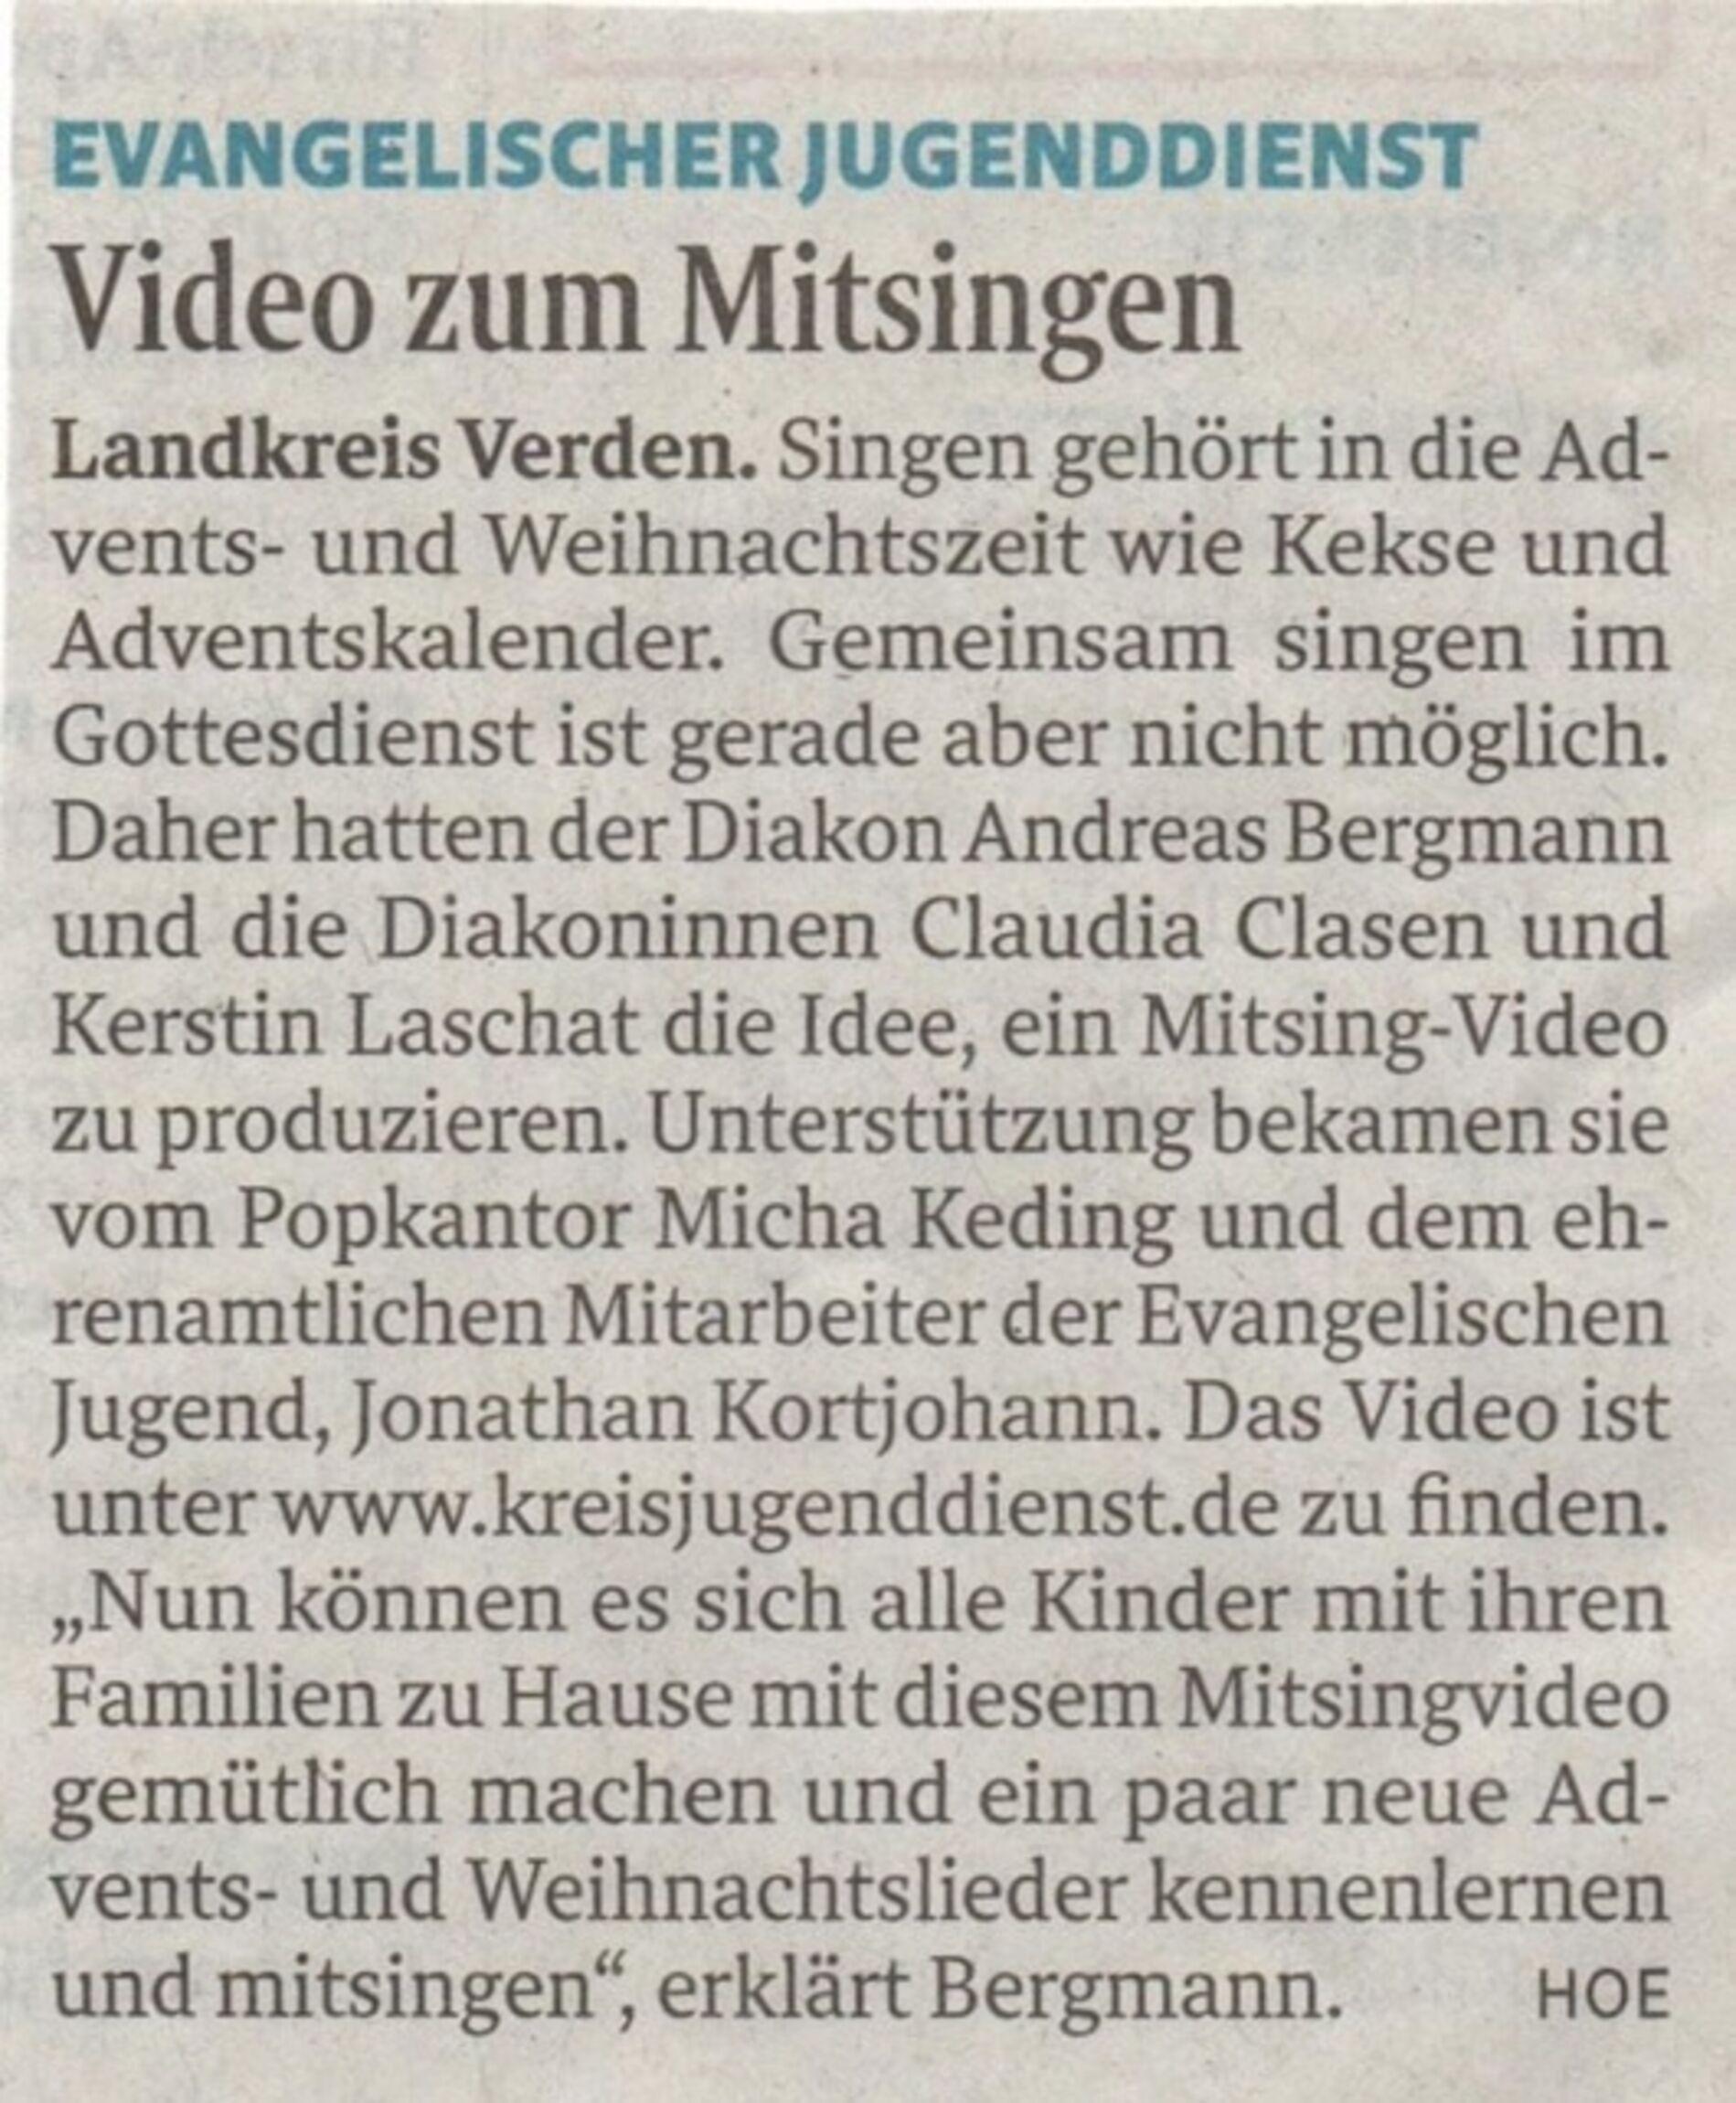 Mitsingvideo